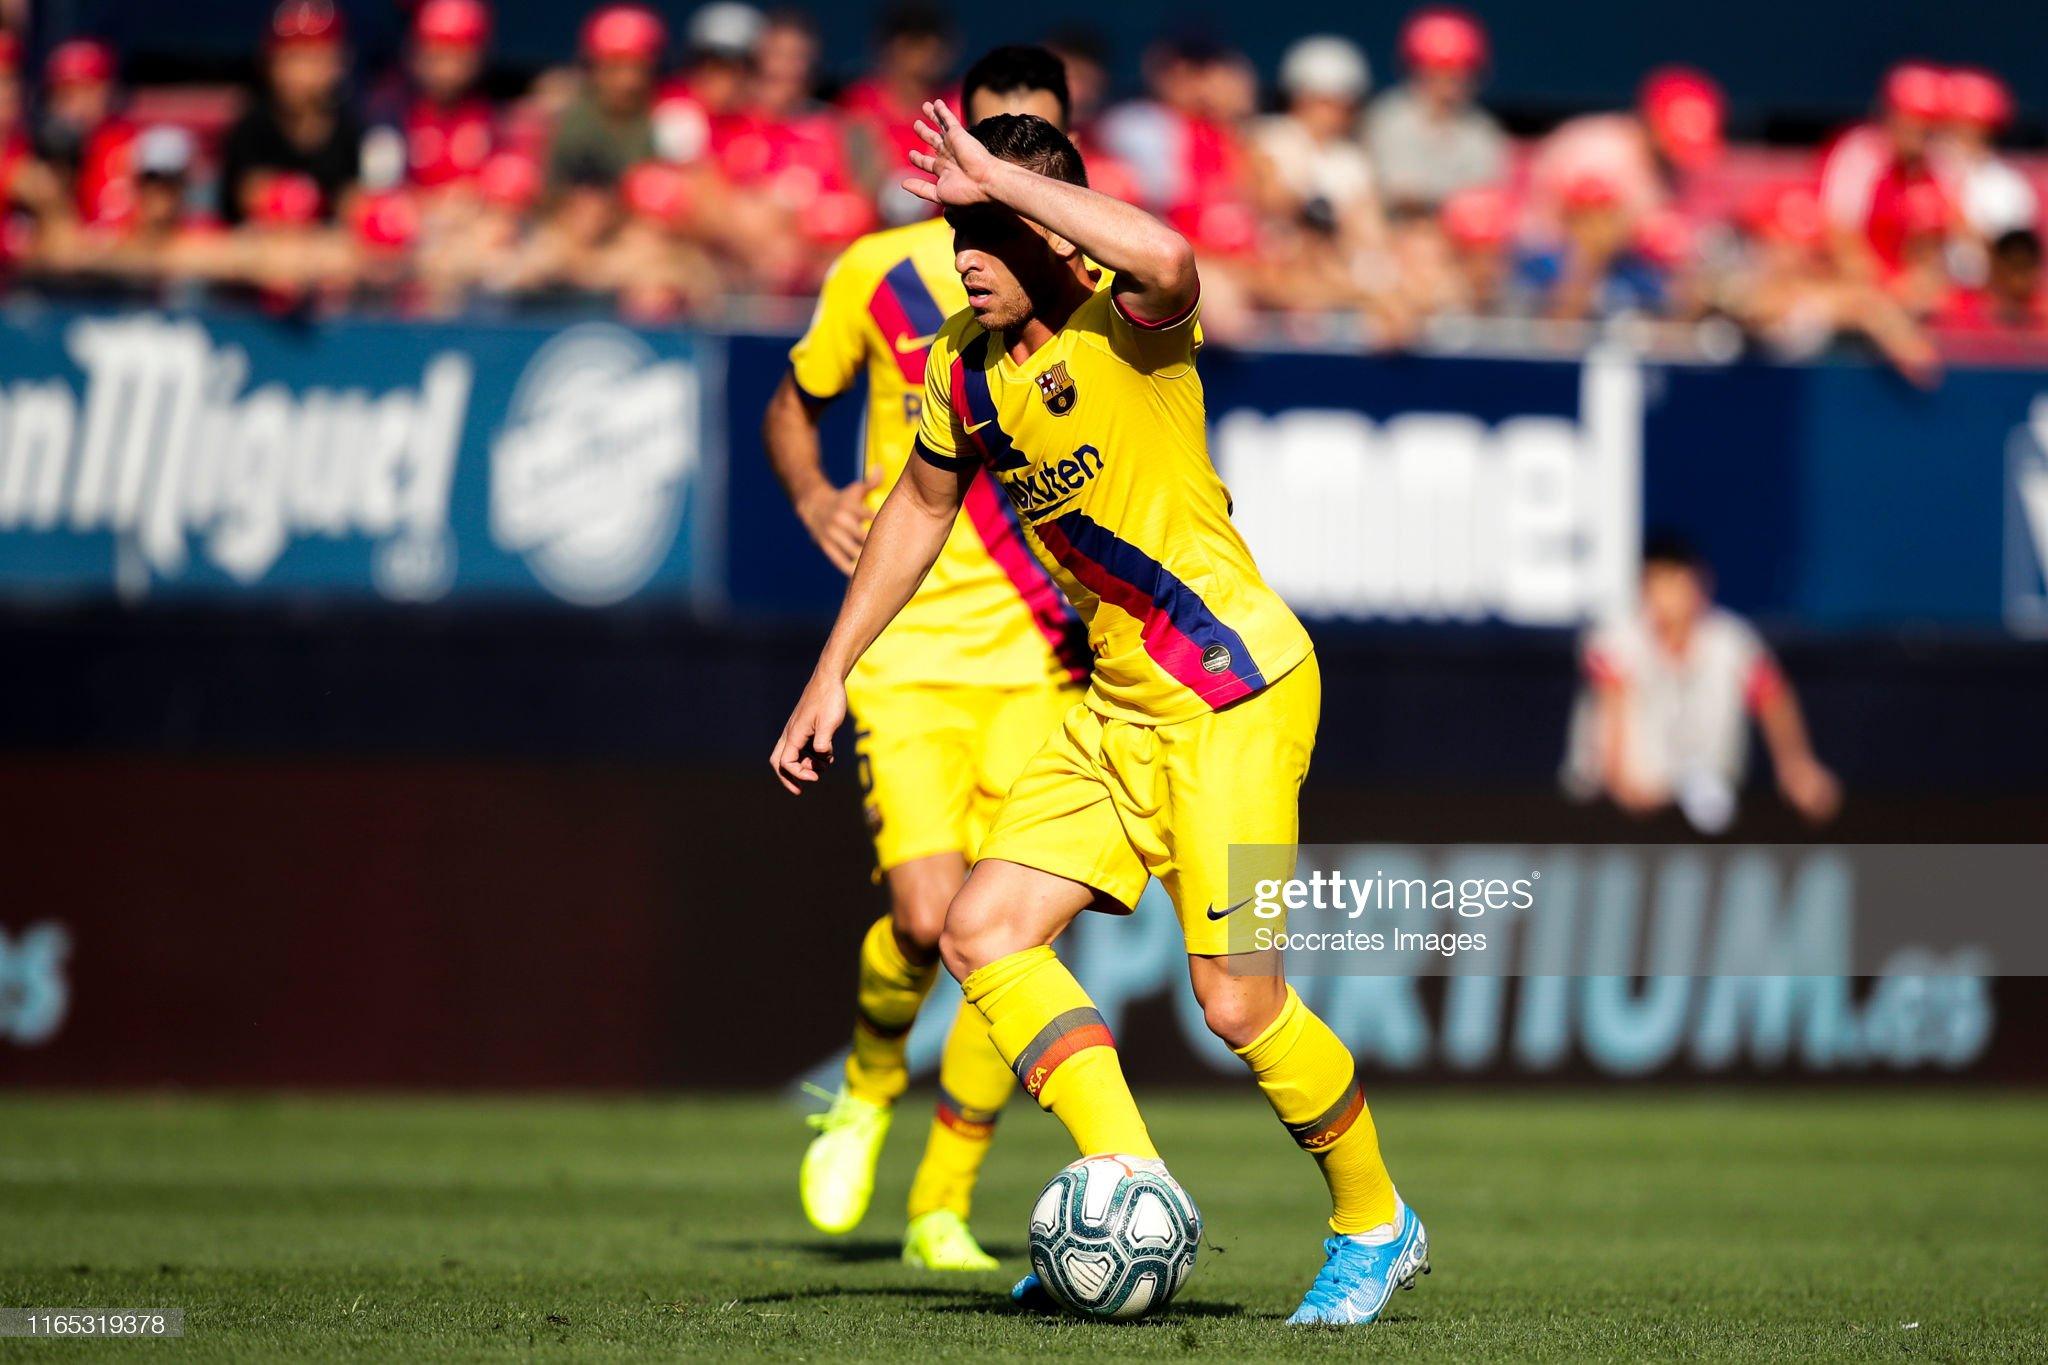 صور مباراة : أوساسونا - برشلونة 2-2 ( 31-08-2019 )  Arthur-of-fc-barcelona-during-the-la-liga-santander-match-between-v-picture-id1165319378?s=2048x2048